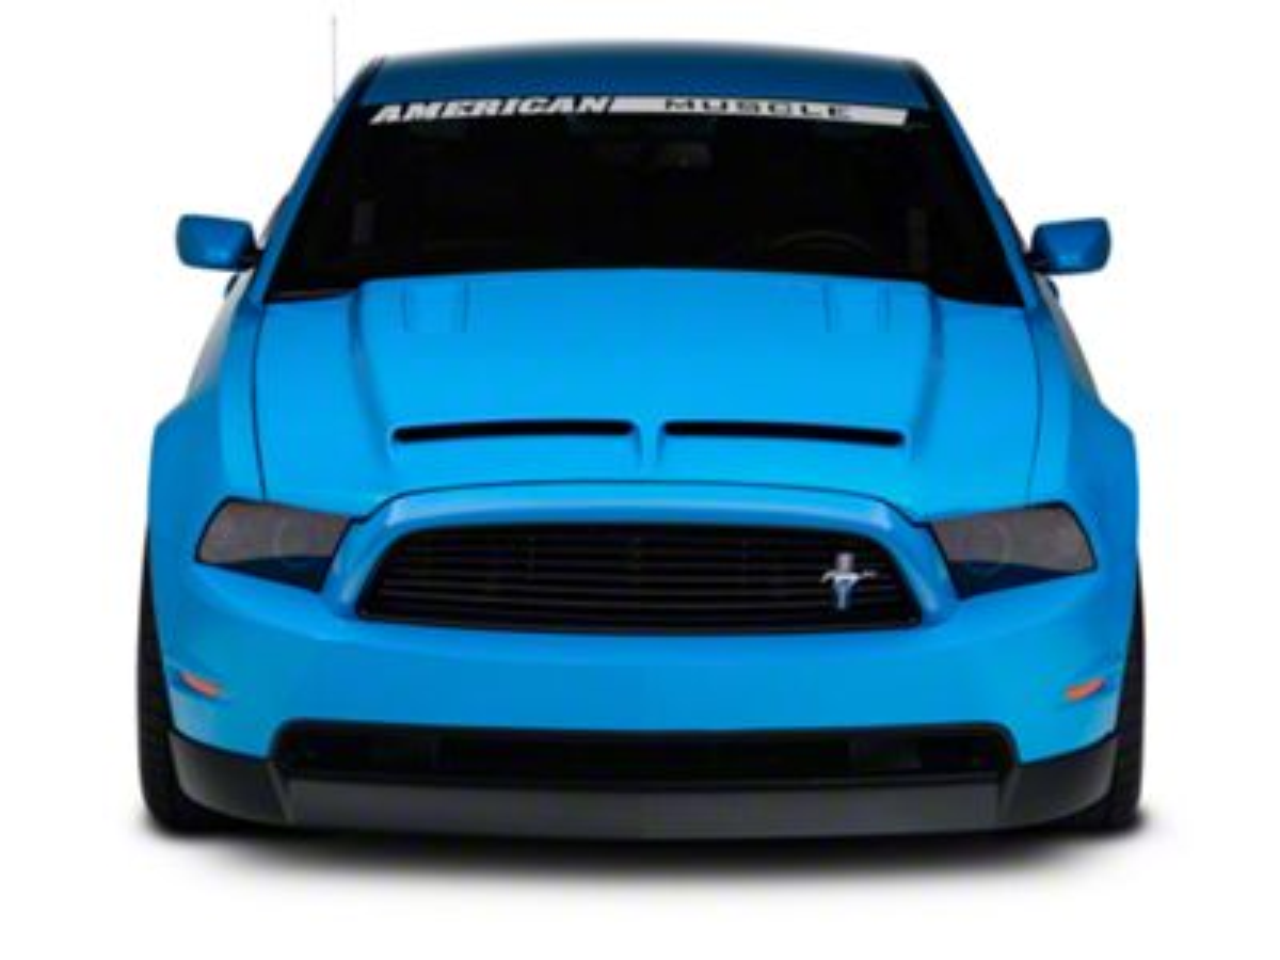 133be8e55eef Cervini s Mustang Ram Air Hood - Unpainted 1198 (10-12 GT